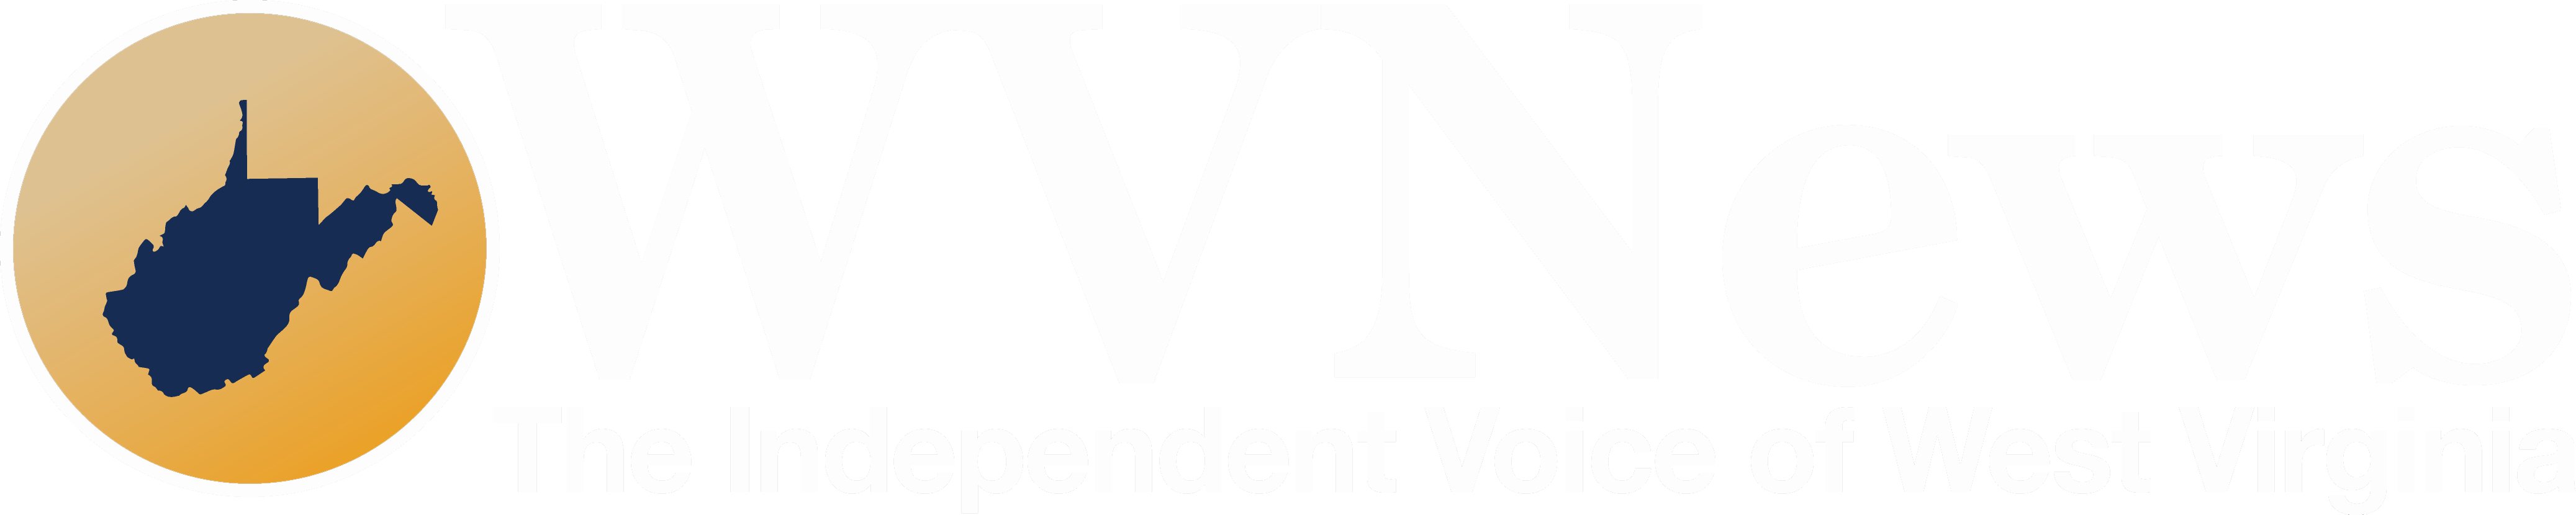 WV News - Wvnews